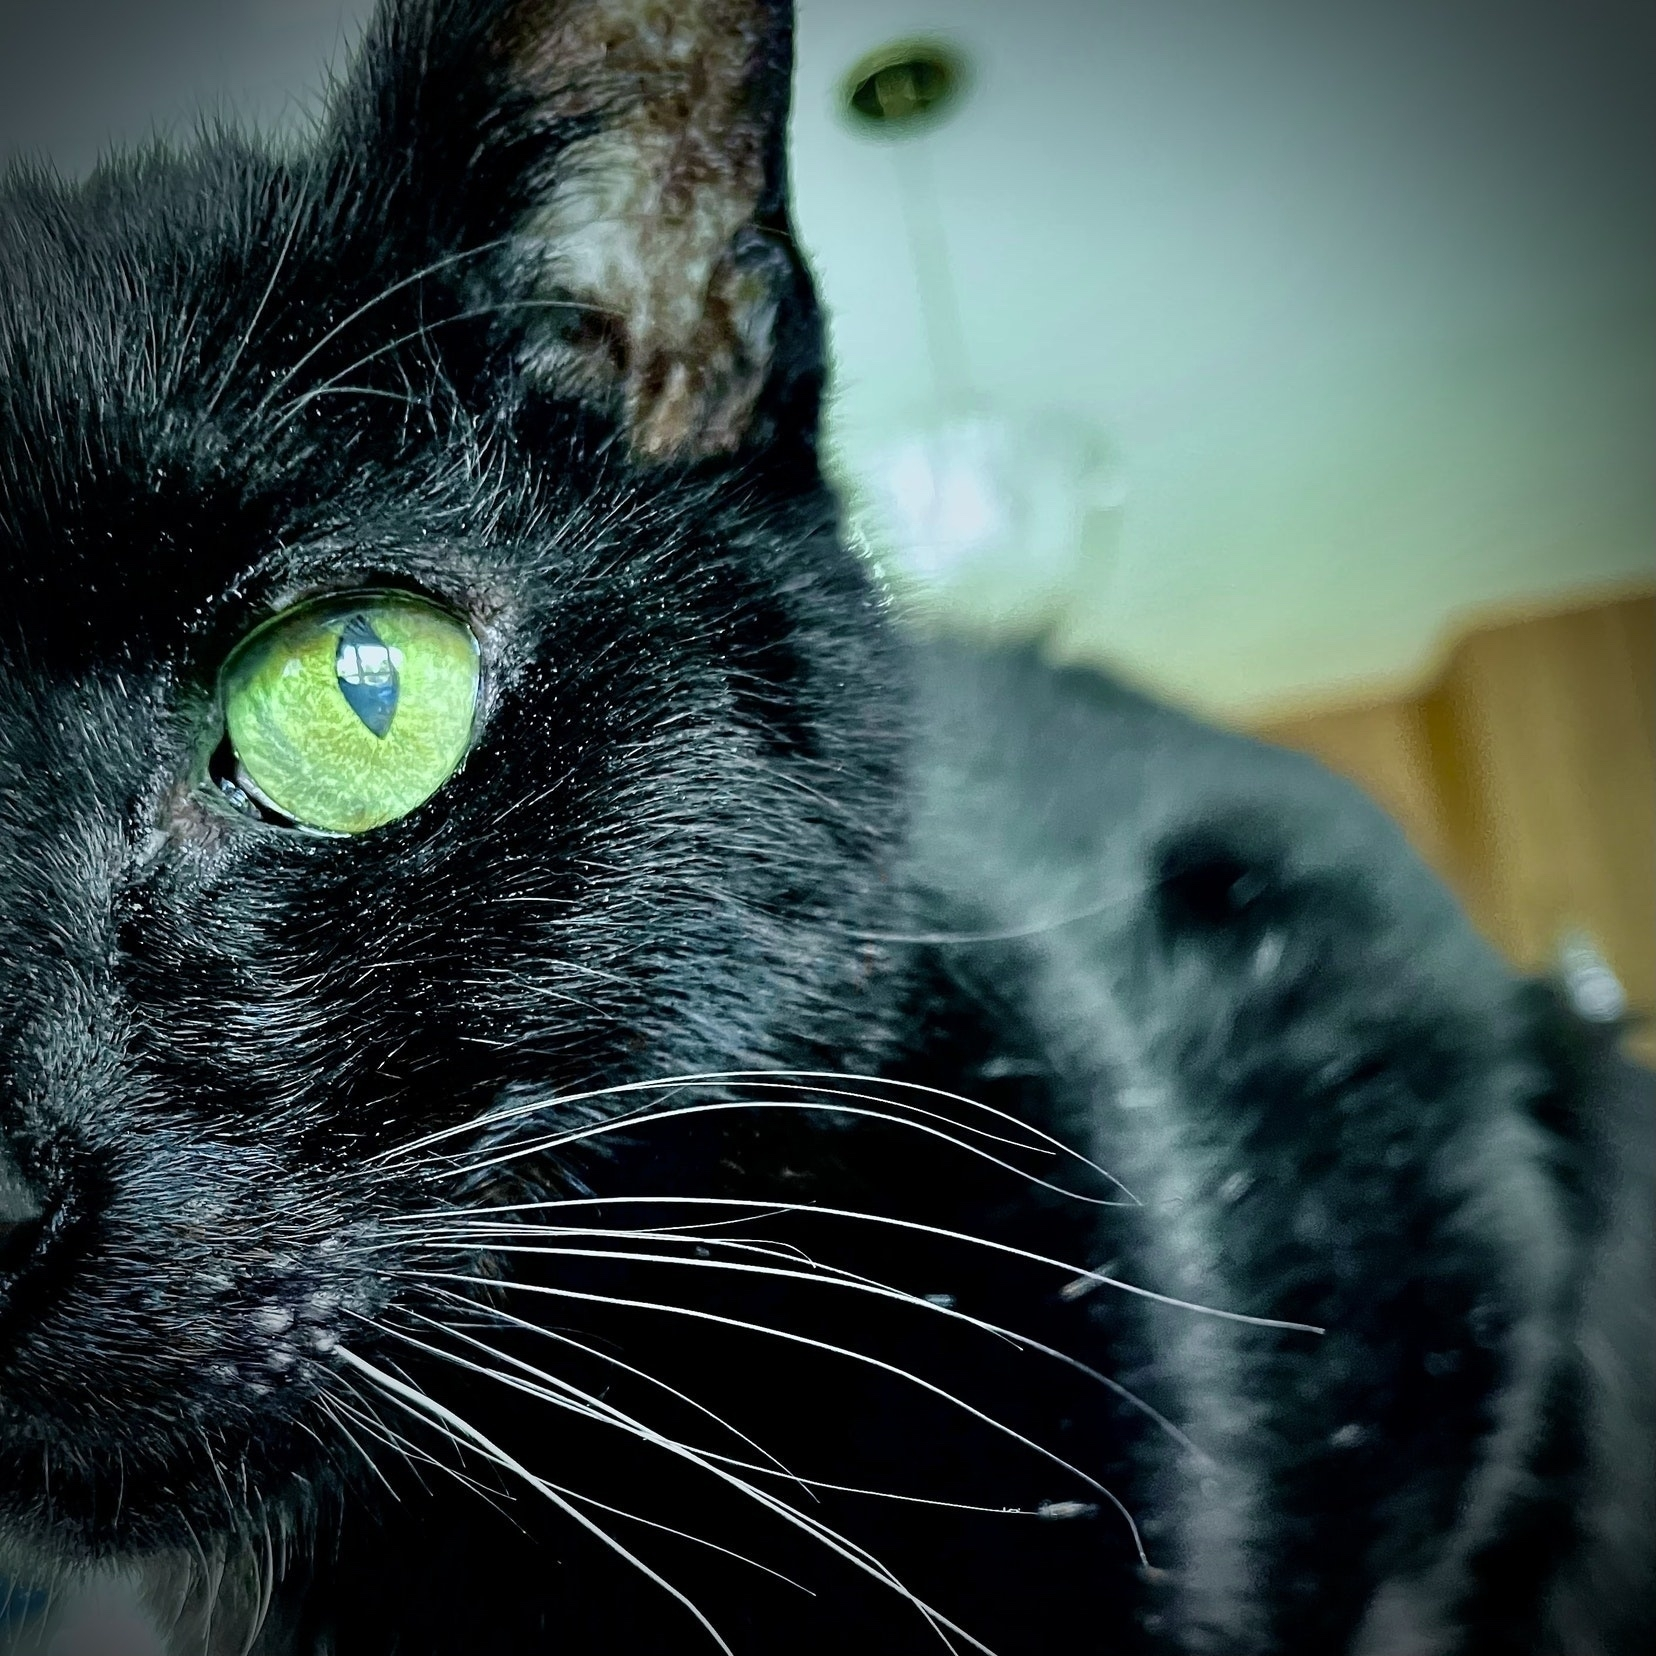 Black cat stares into the camera.